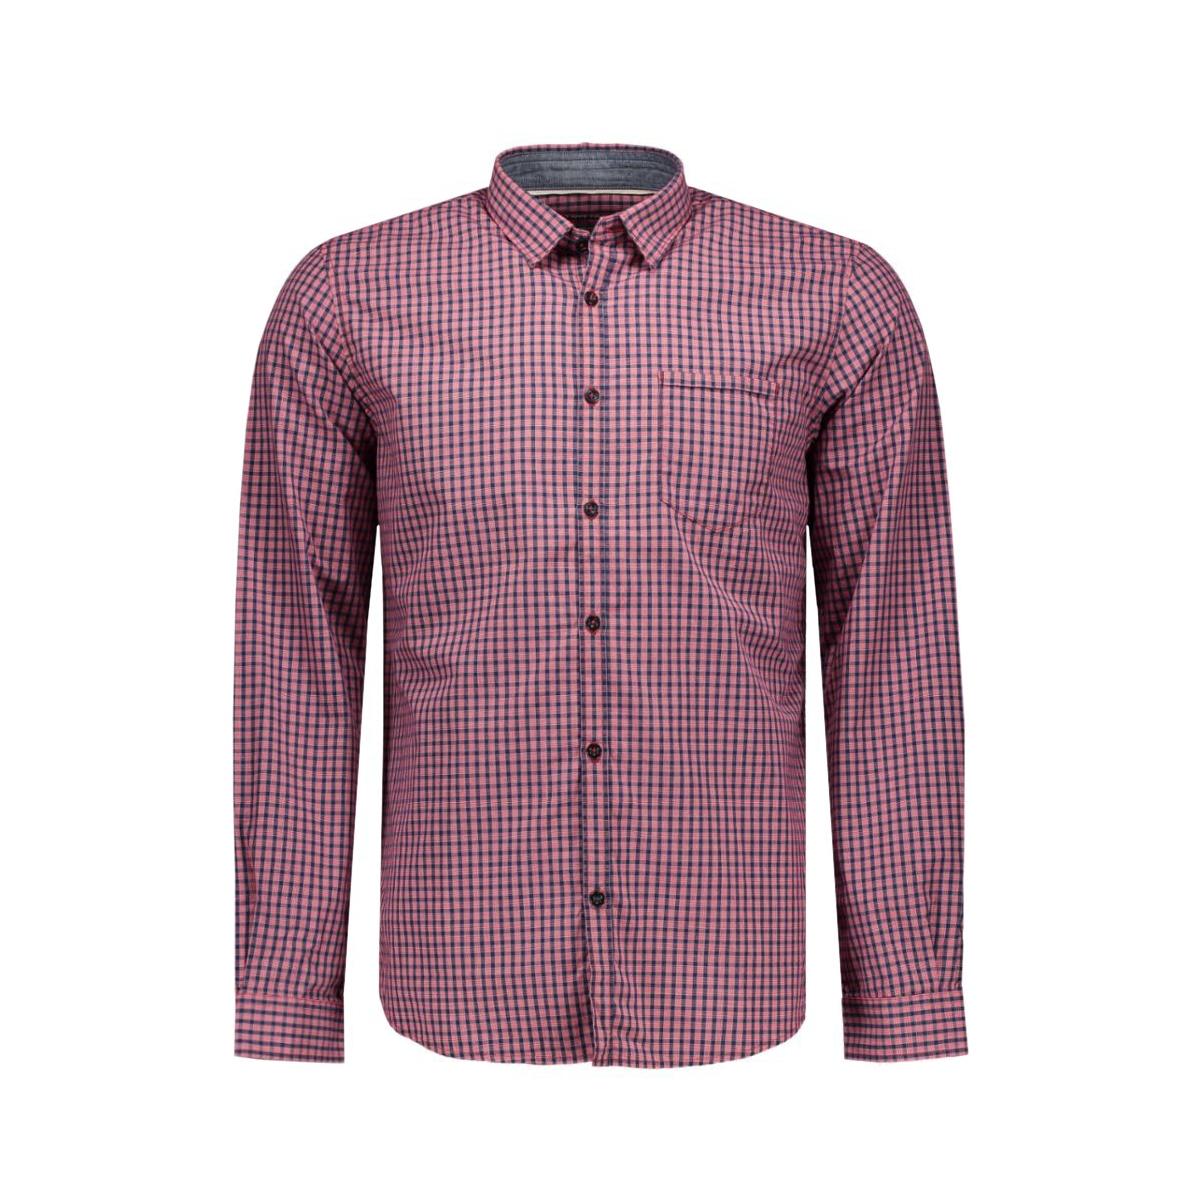 2032101.09.10 tom tailor overhemd 5479